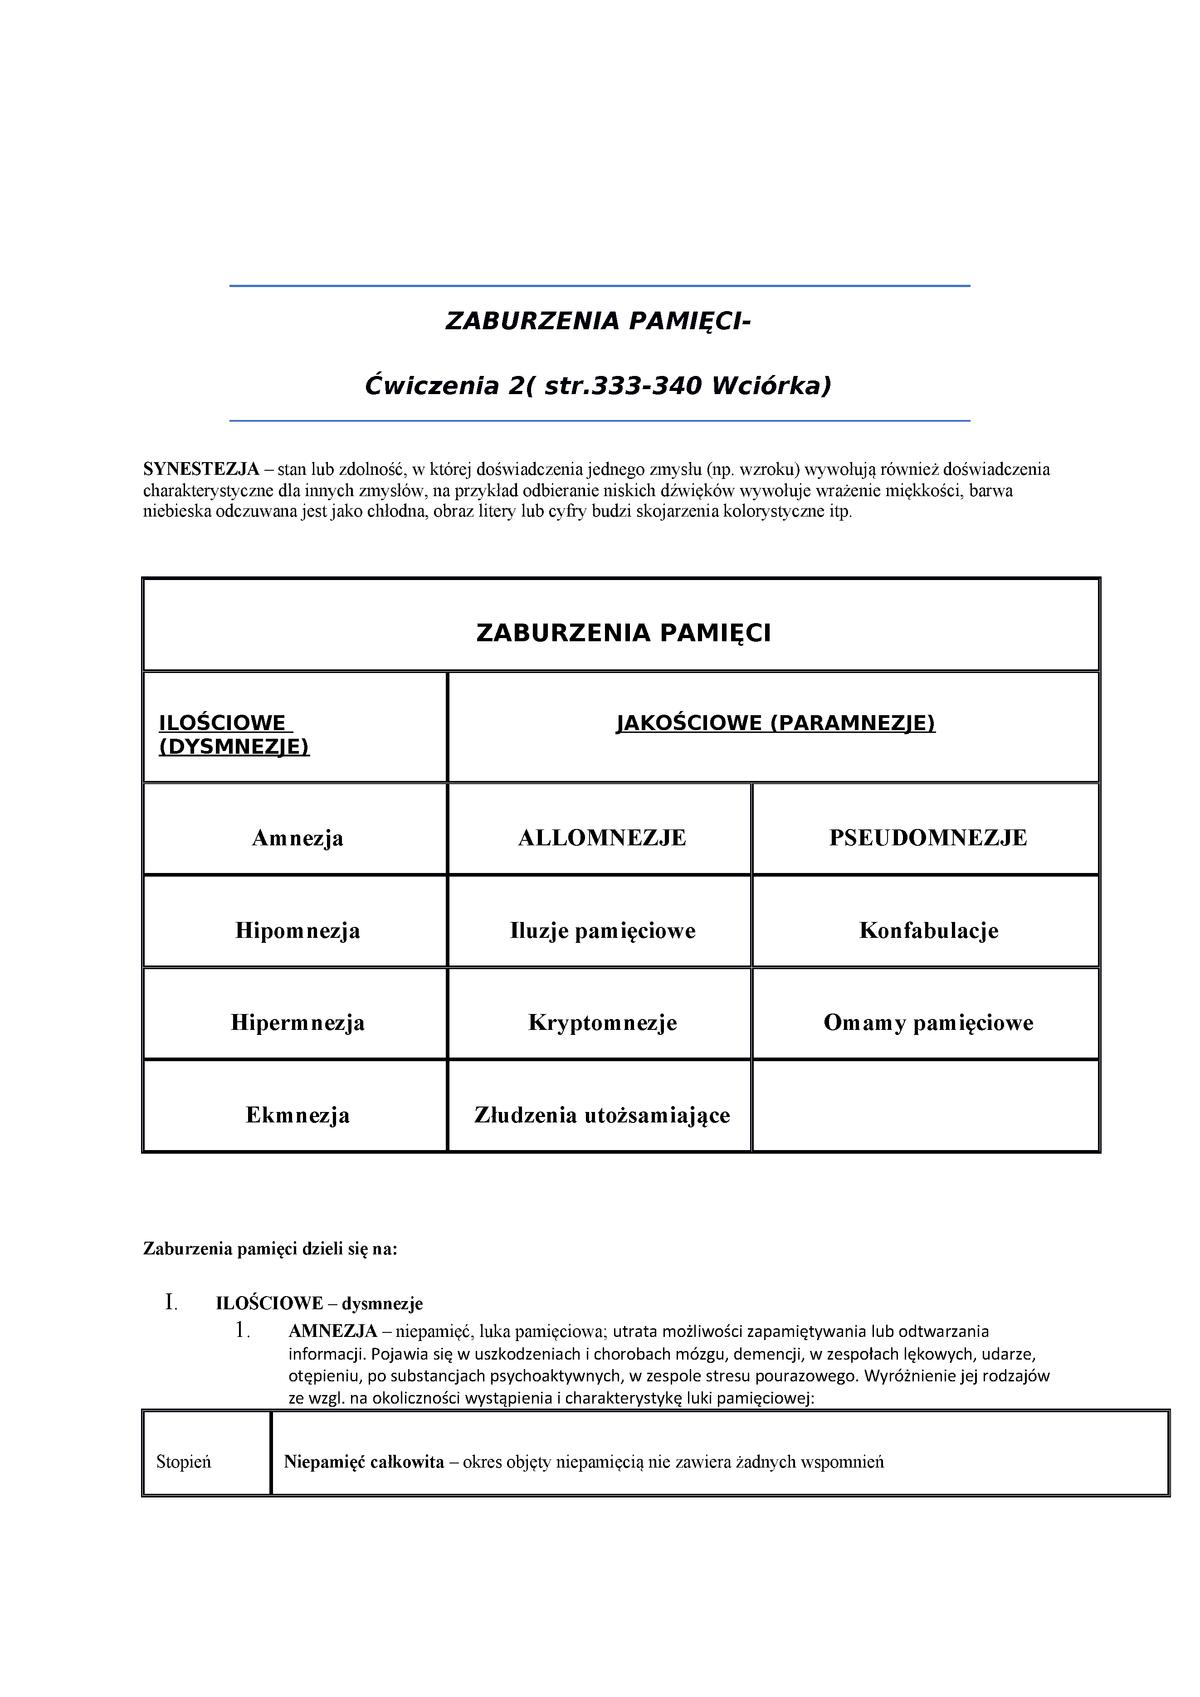 Psychopatologia Notatki Psychopatologia 06 Ps Nm 018 Uś